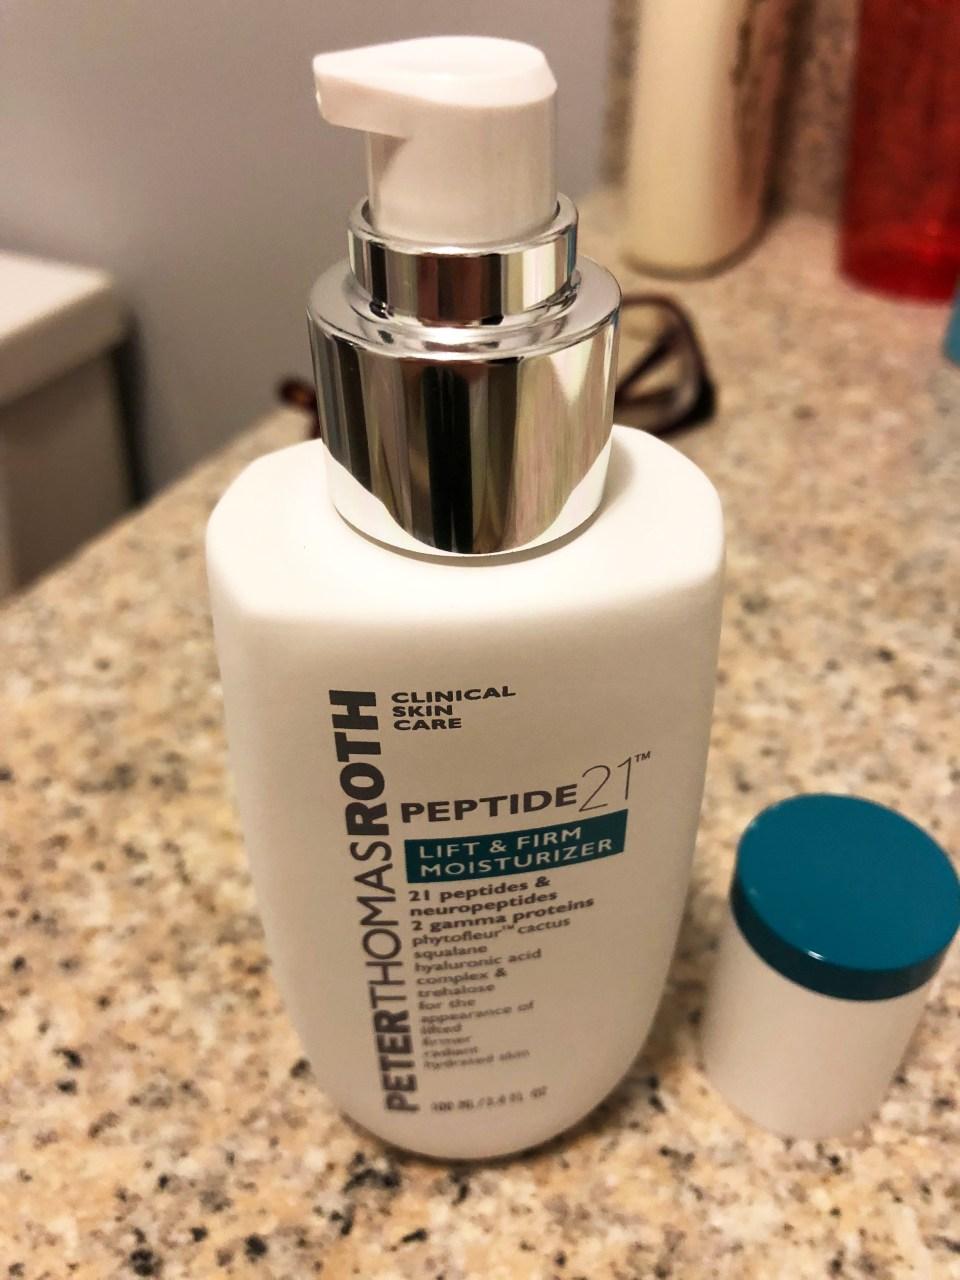 Peptide 21 Lift & Firm Moisturizer